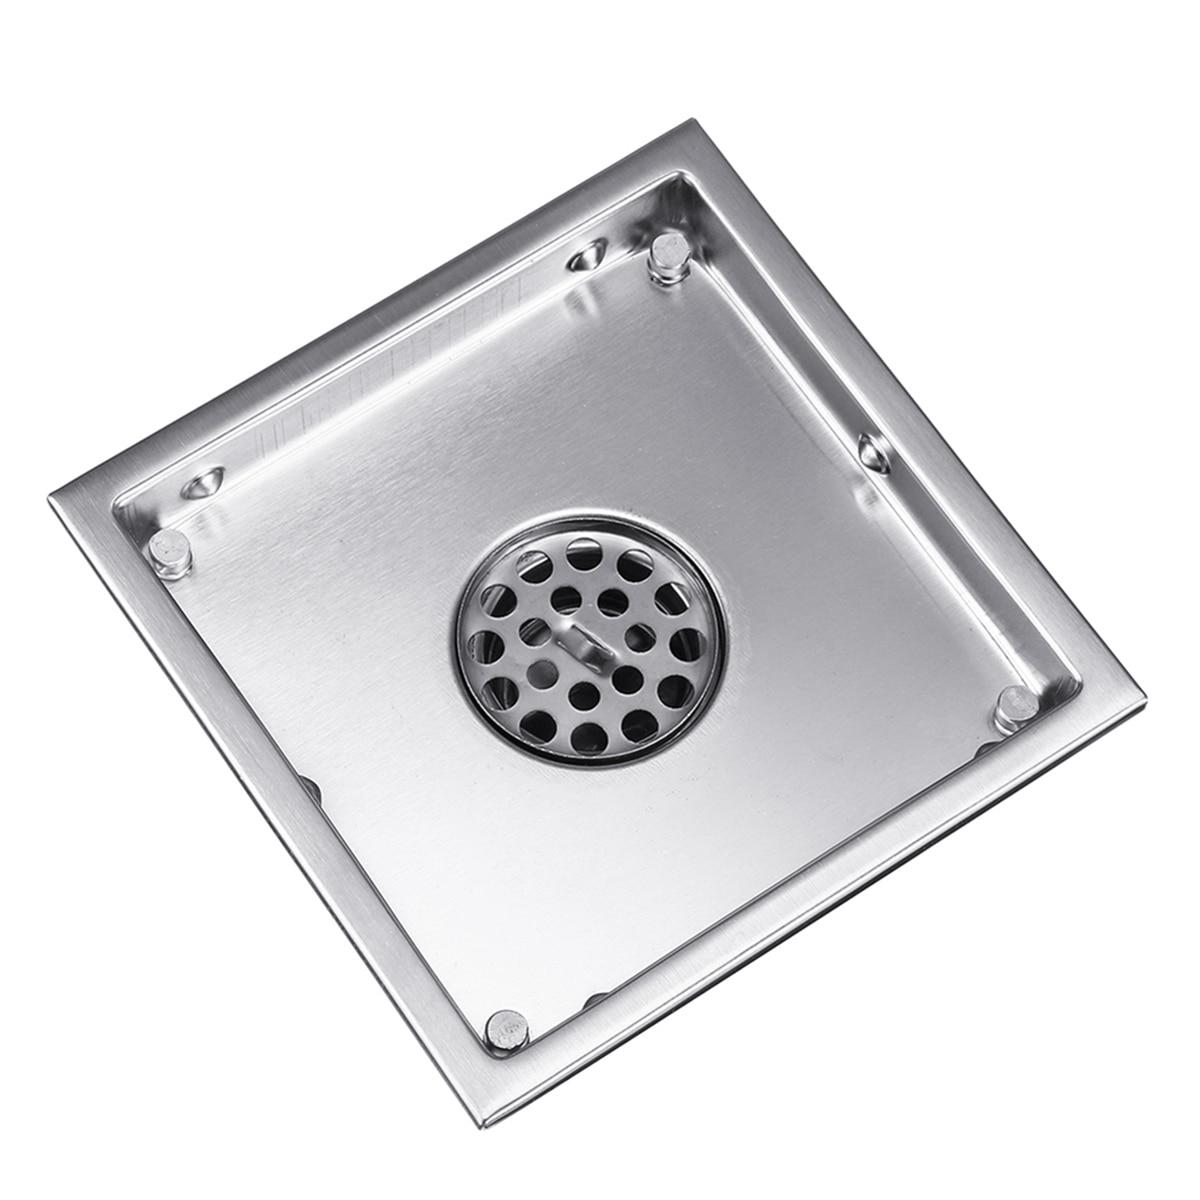 6 Inch Stainless Steel Floor Drain Quyanre Bathtub Shower Drainer Floor Strainer 15x15cm Square Invisible Bathroom Floor Drain